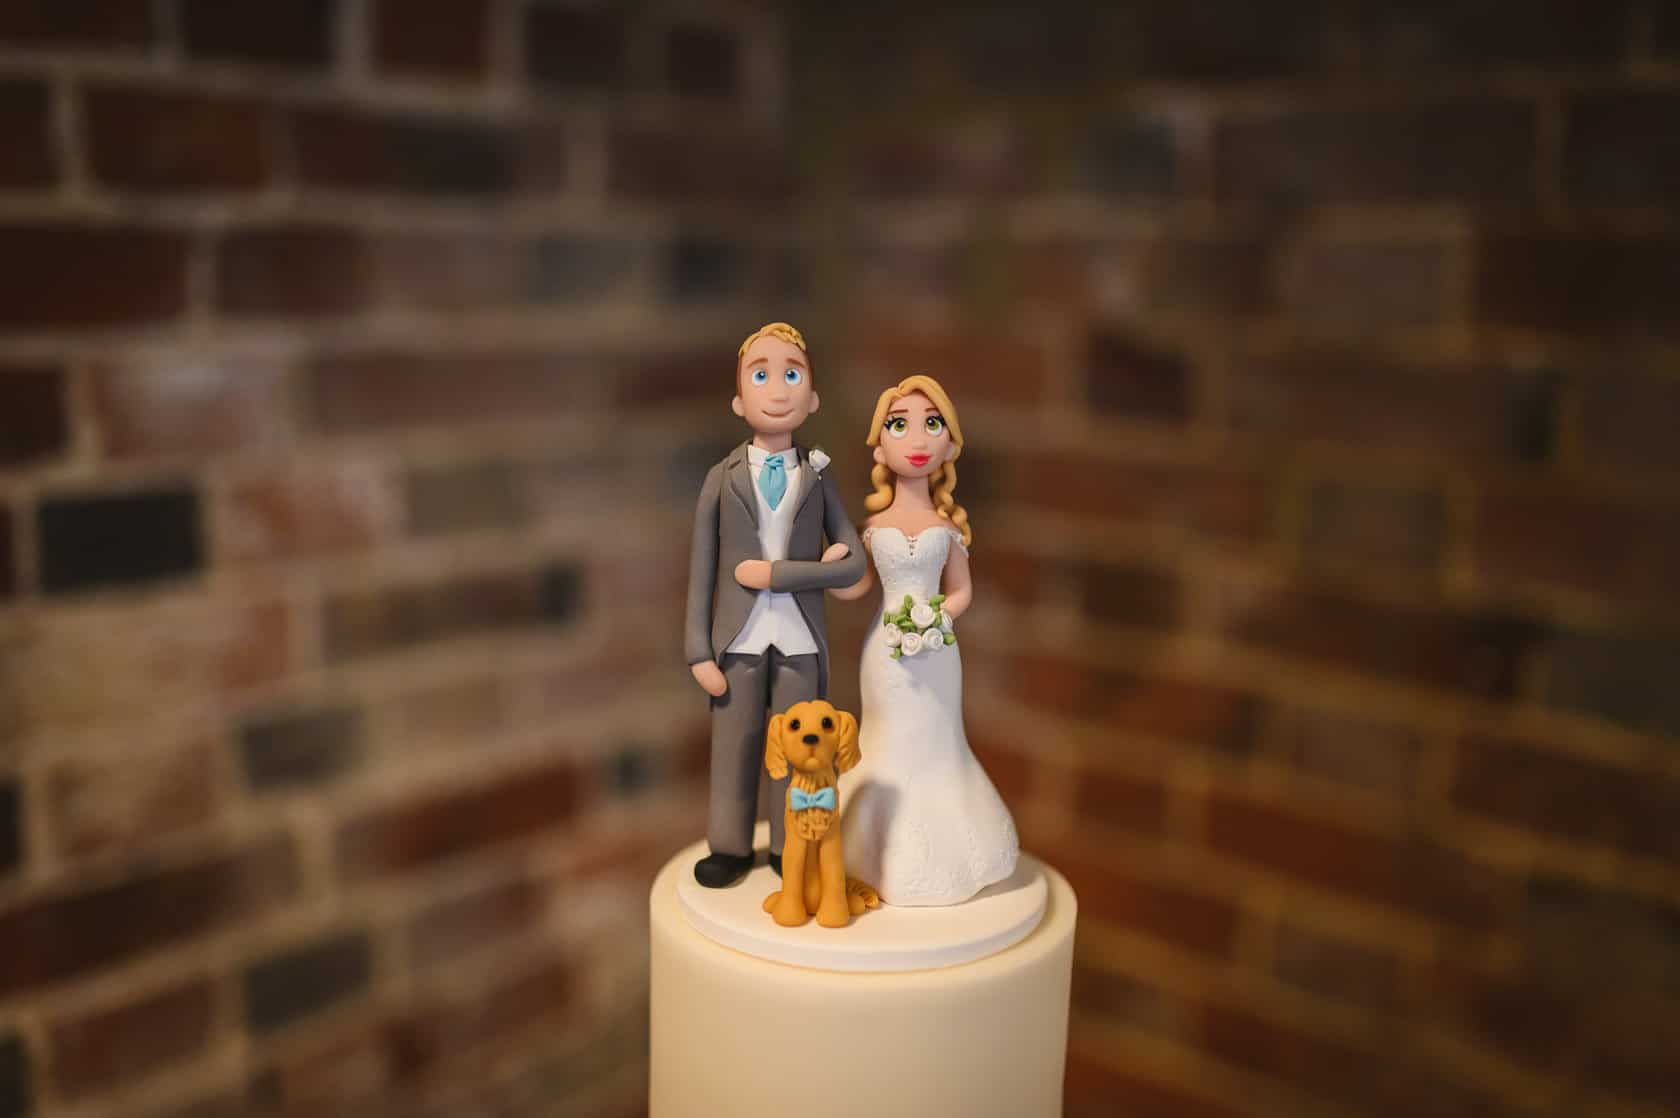 Best_Wedding_Photography_2019_Wedding-Photographer-Essex_092